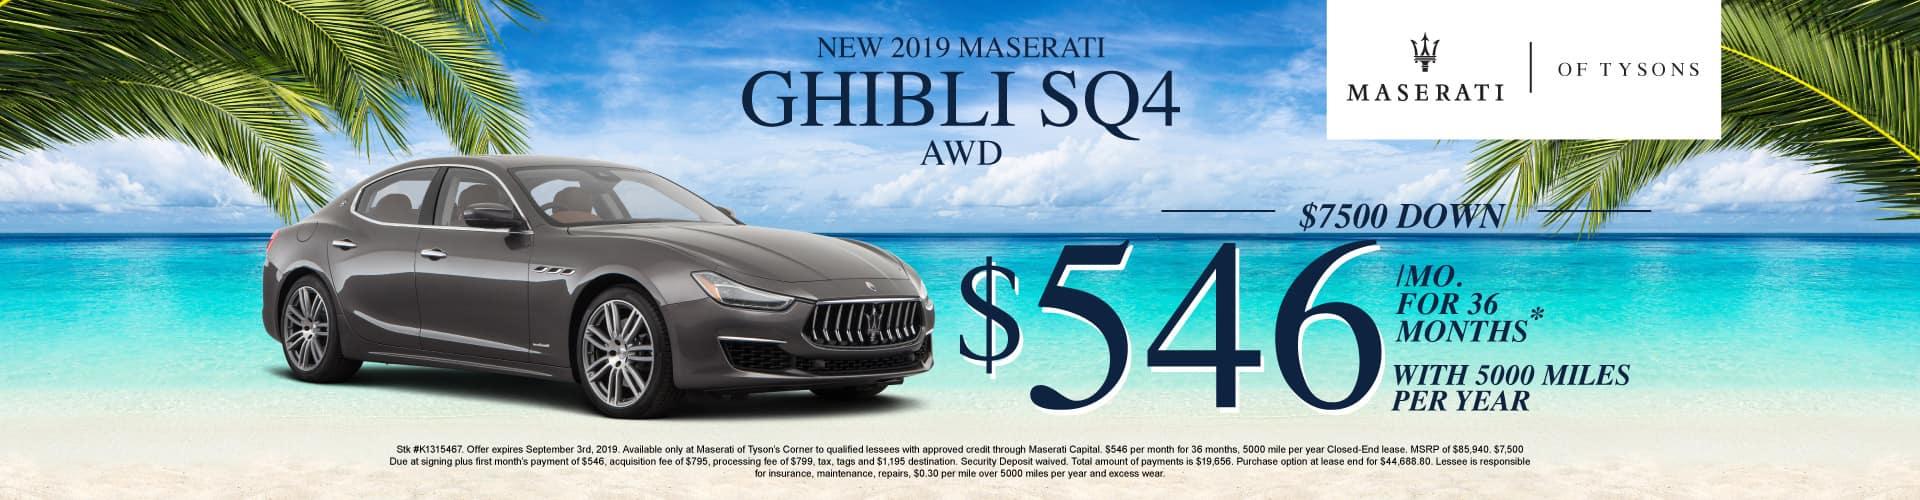 Ghibli Sq4 AWD Specials